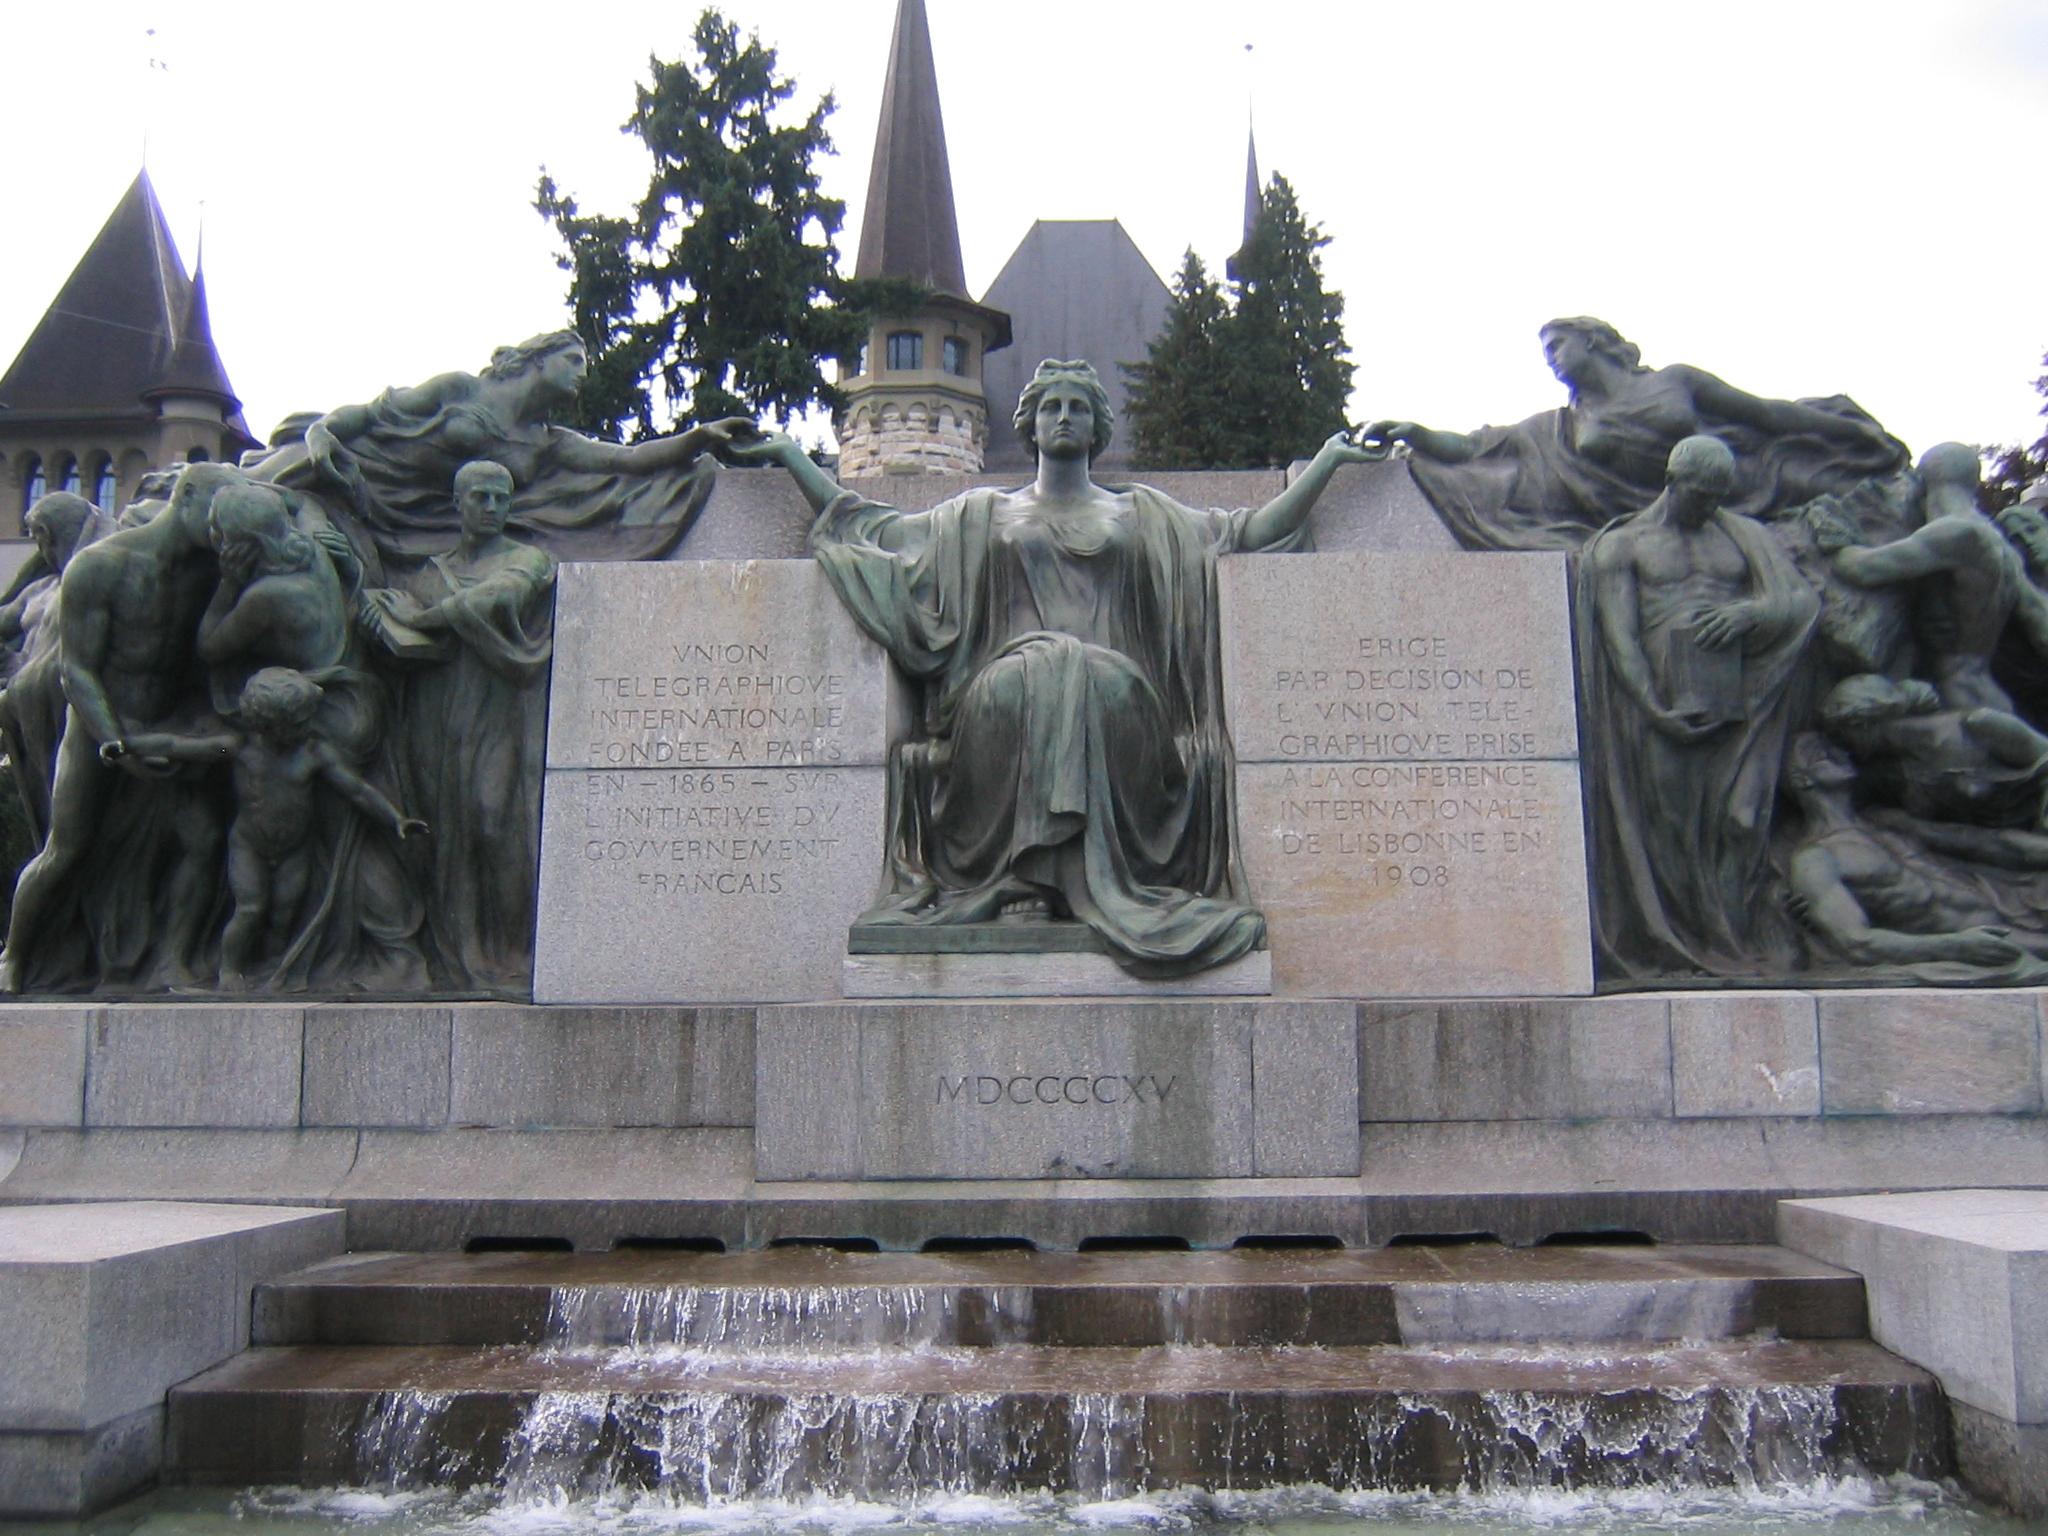 https://i0.wp.com/upload.wikimedia.org/wikipedia/commons/a/a9/ITU_monument%2C_Bern.jpg